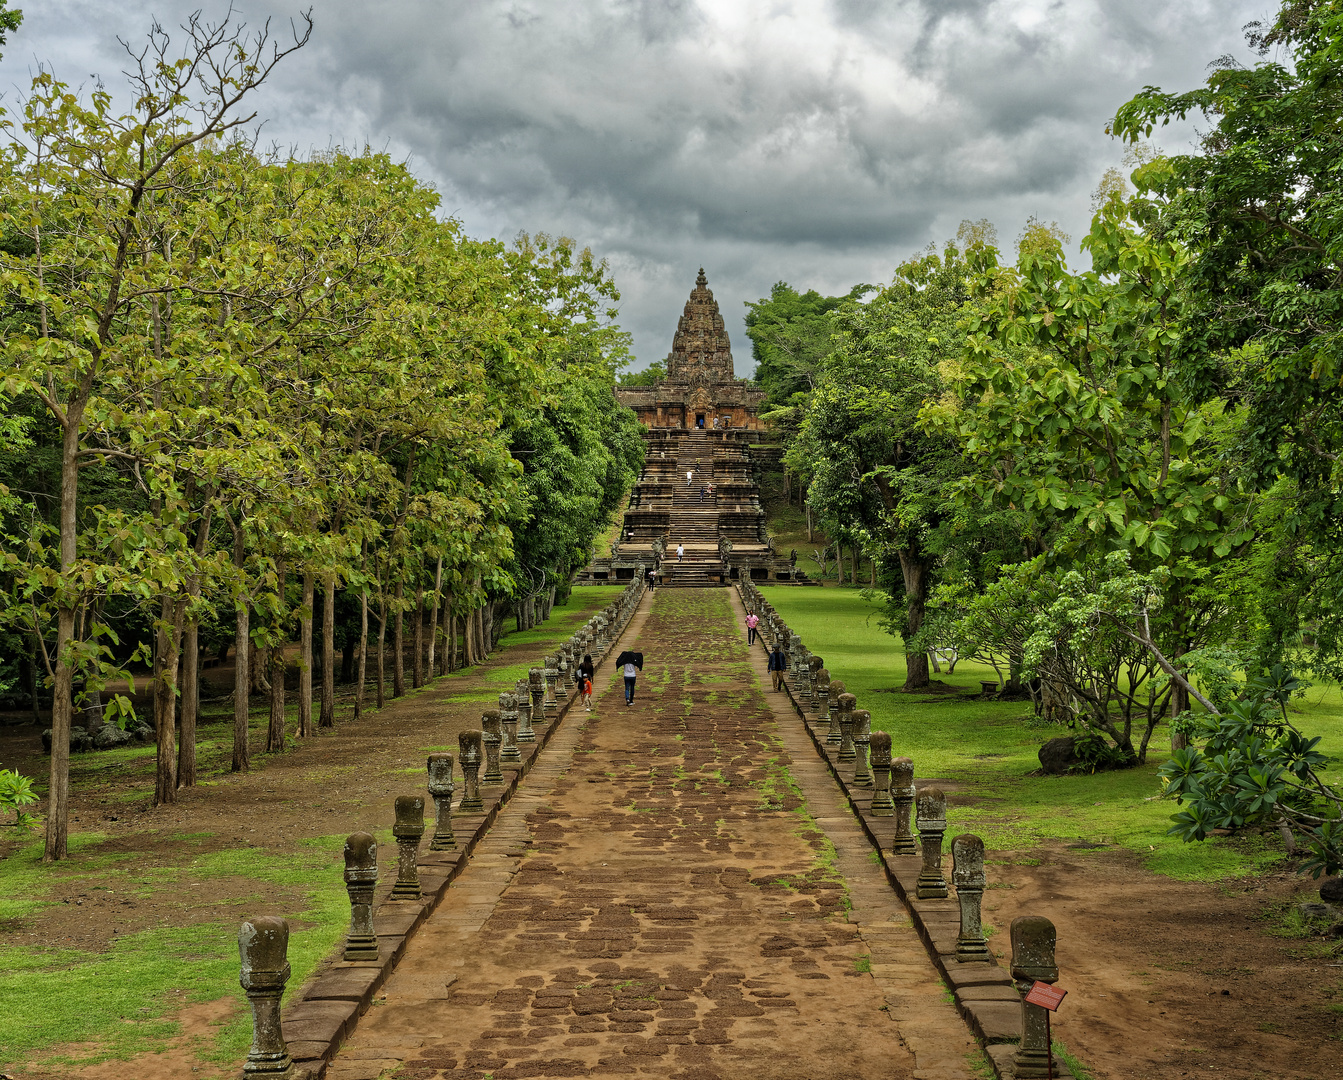 Allee zum zentralen Heiligtum Phanom Rung